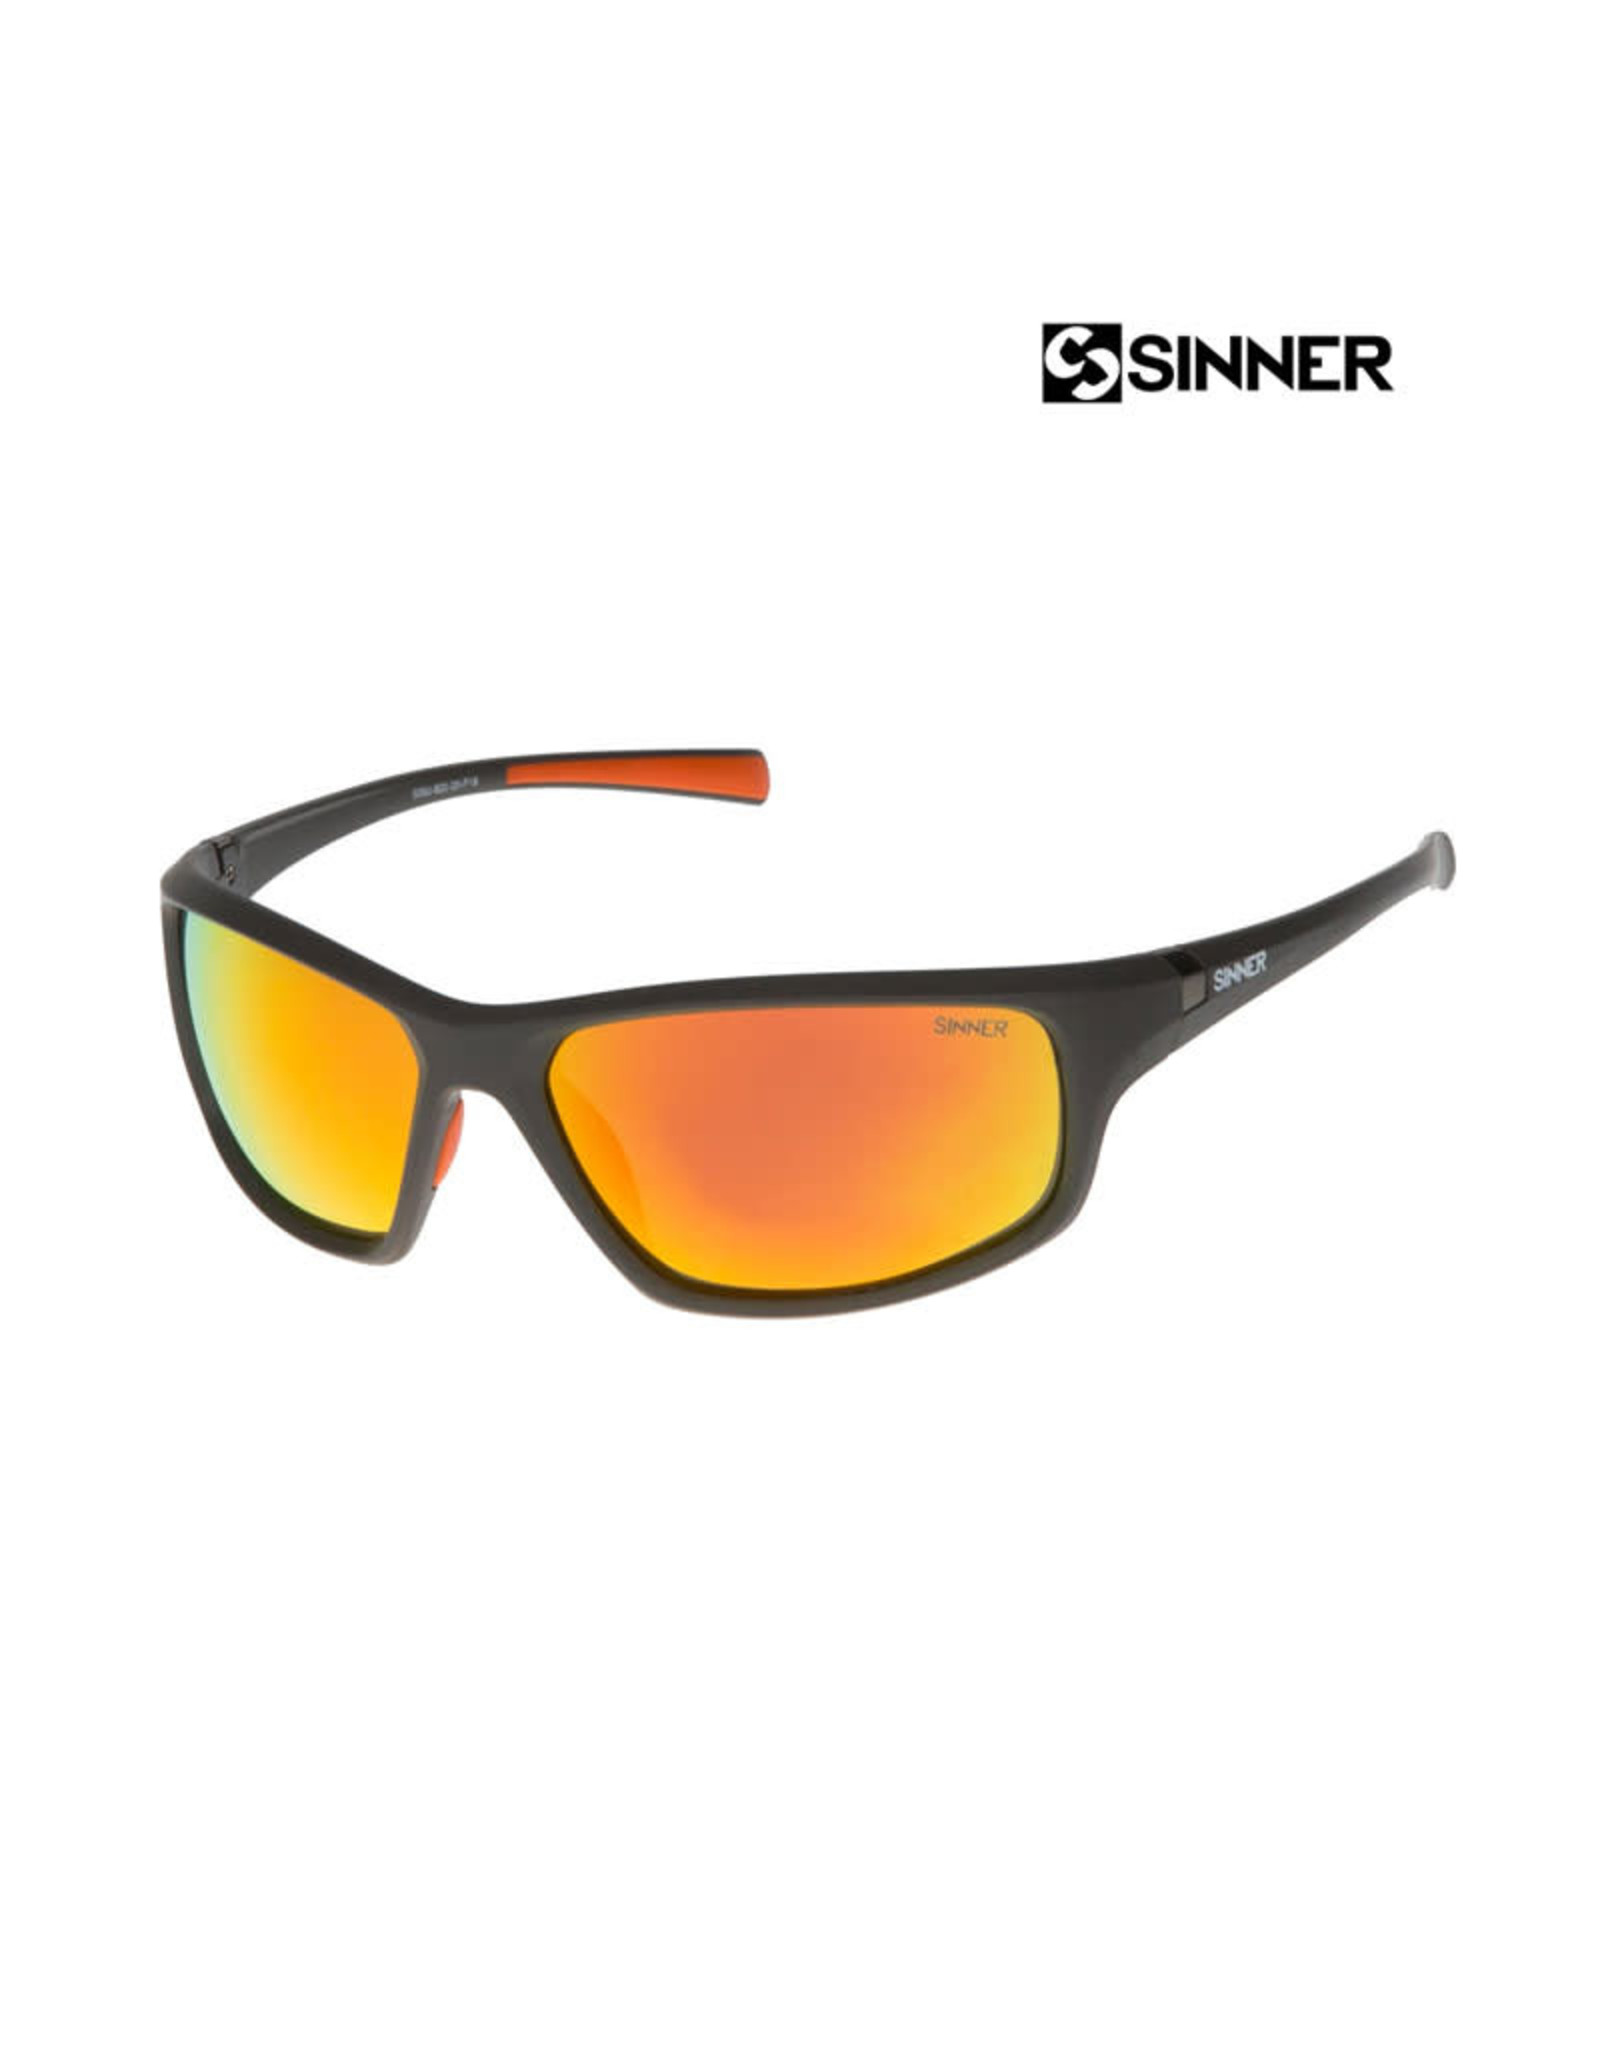 SINNER SINNER FONDS MT Dark grey-Sintec Smoke Zonnebril